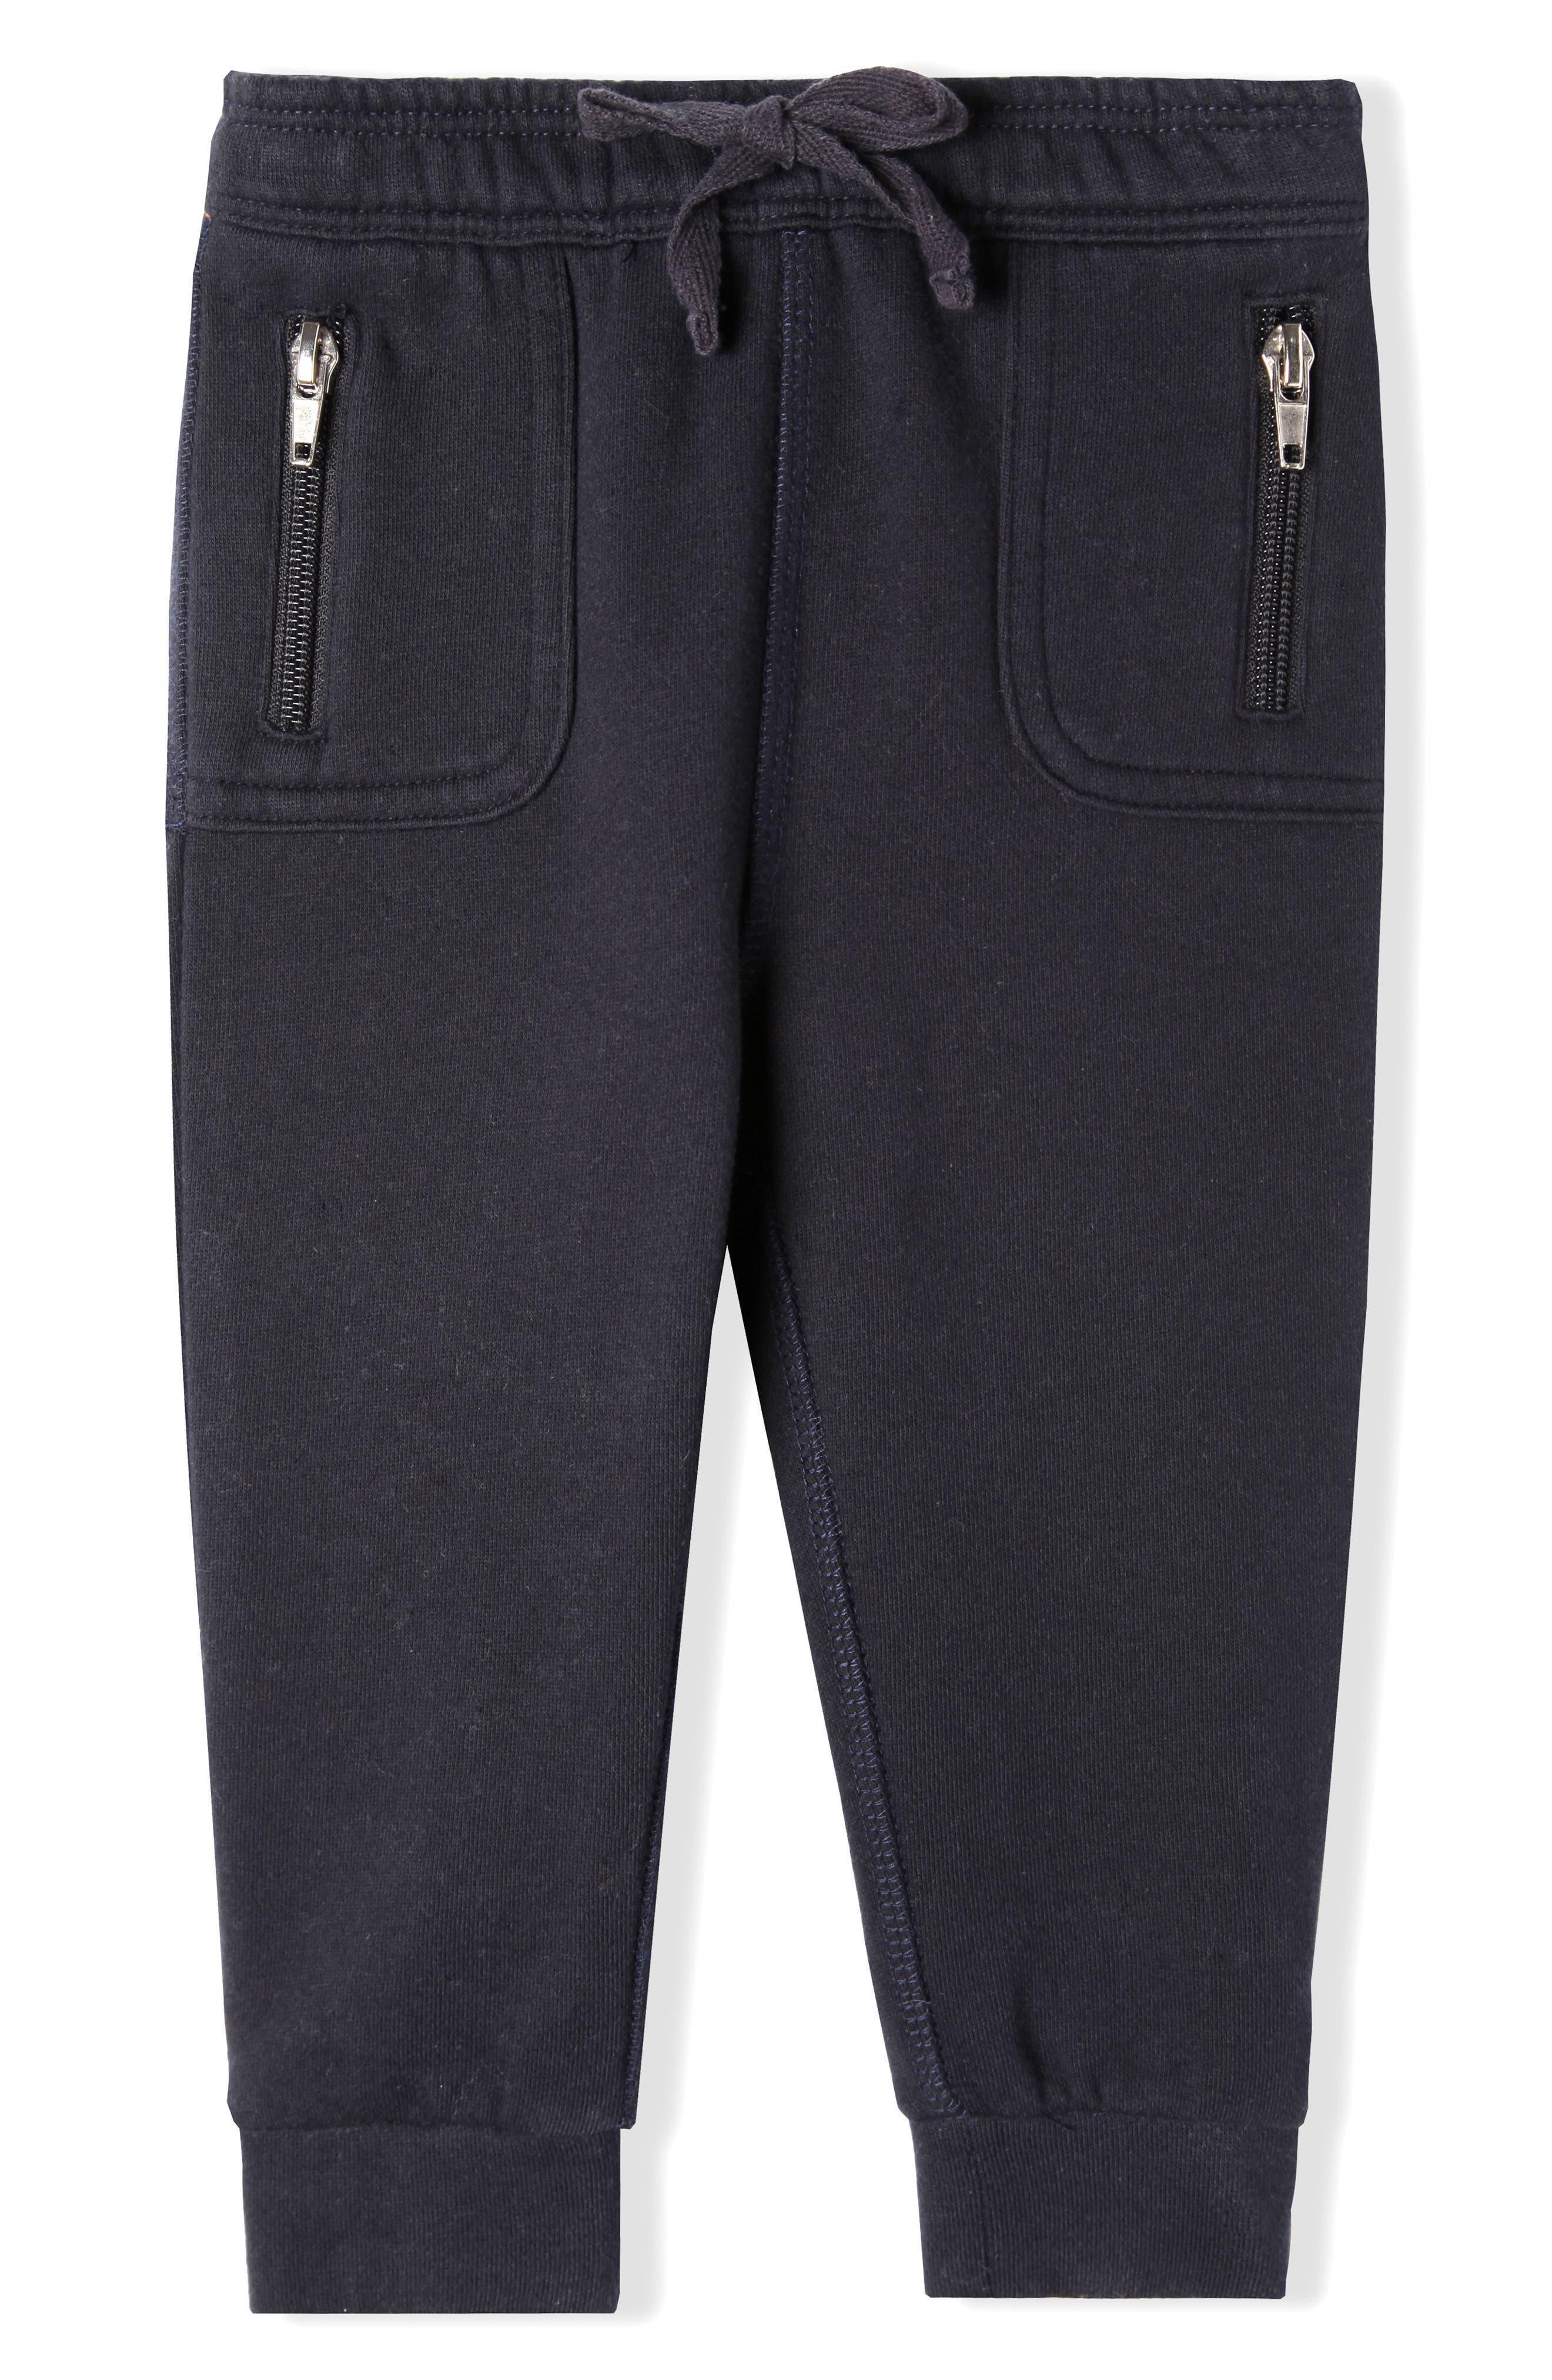 Mercer Organic Cotton Jogger Pants,                         Main,                         color, True Navy